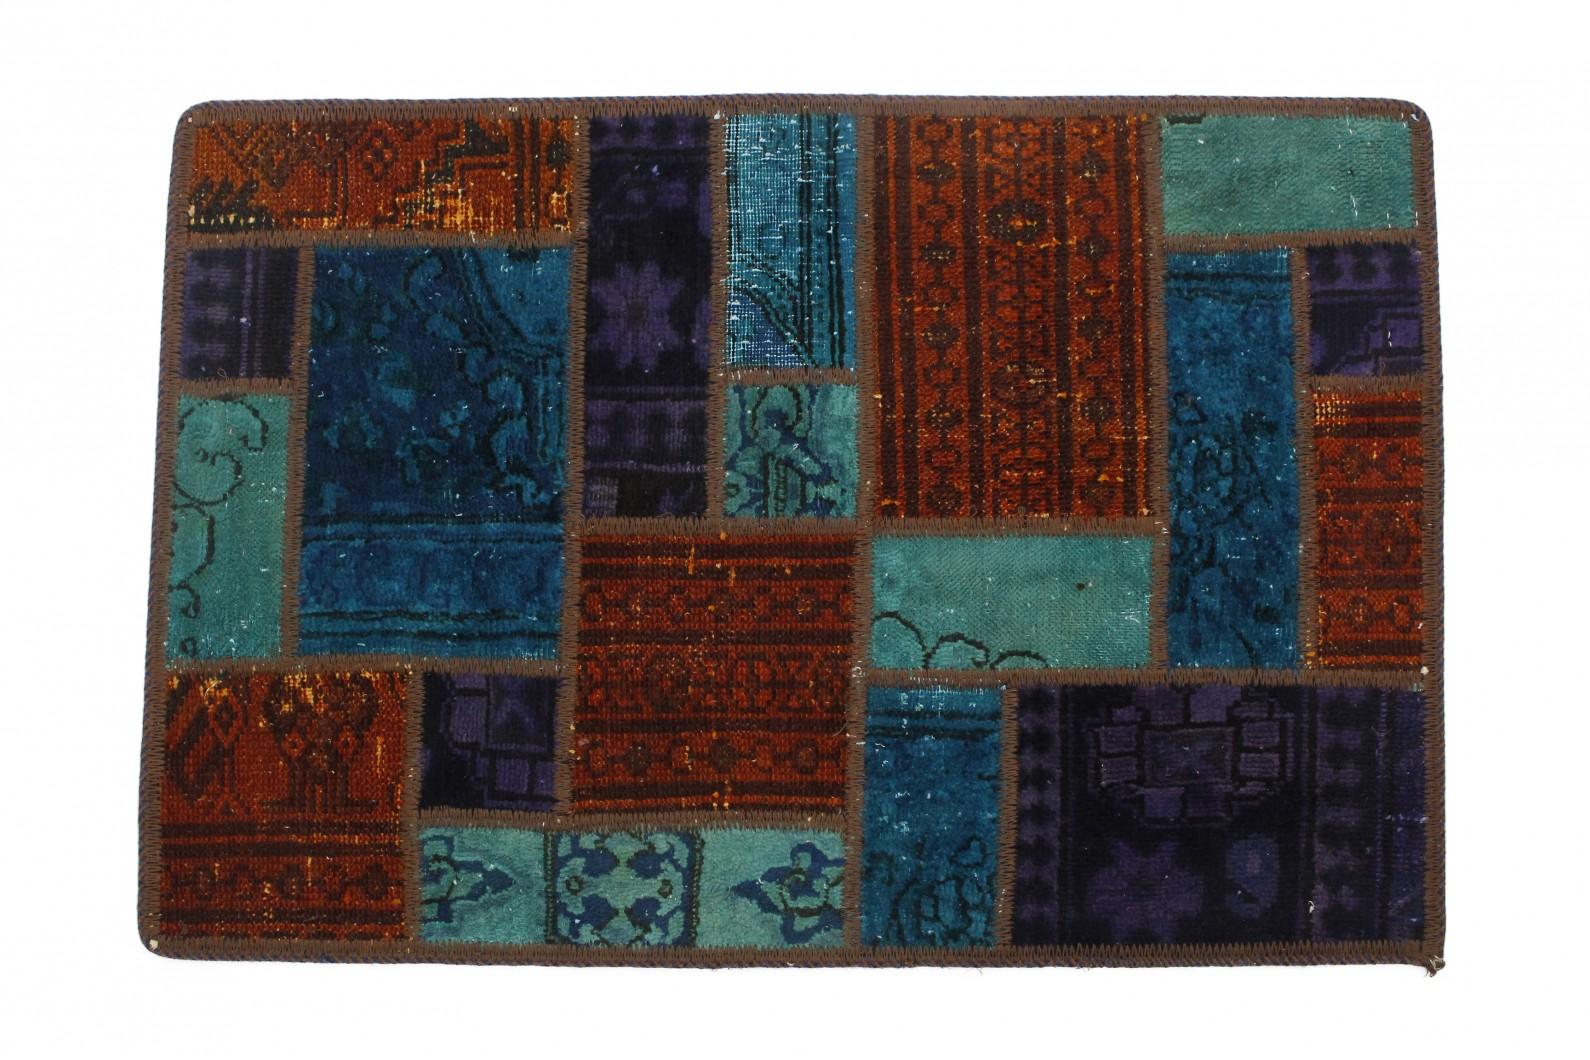 Patchwork Teppich Türkis Rot in 90x60 (1 / 2)